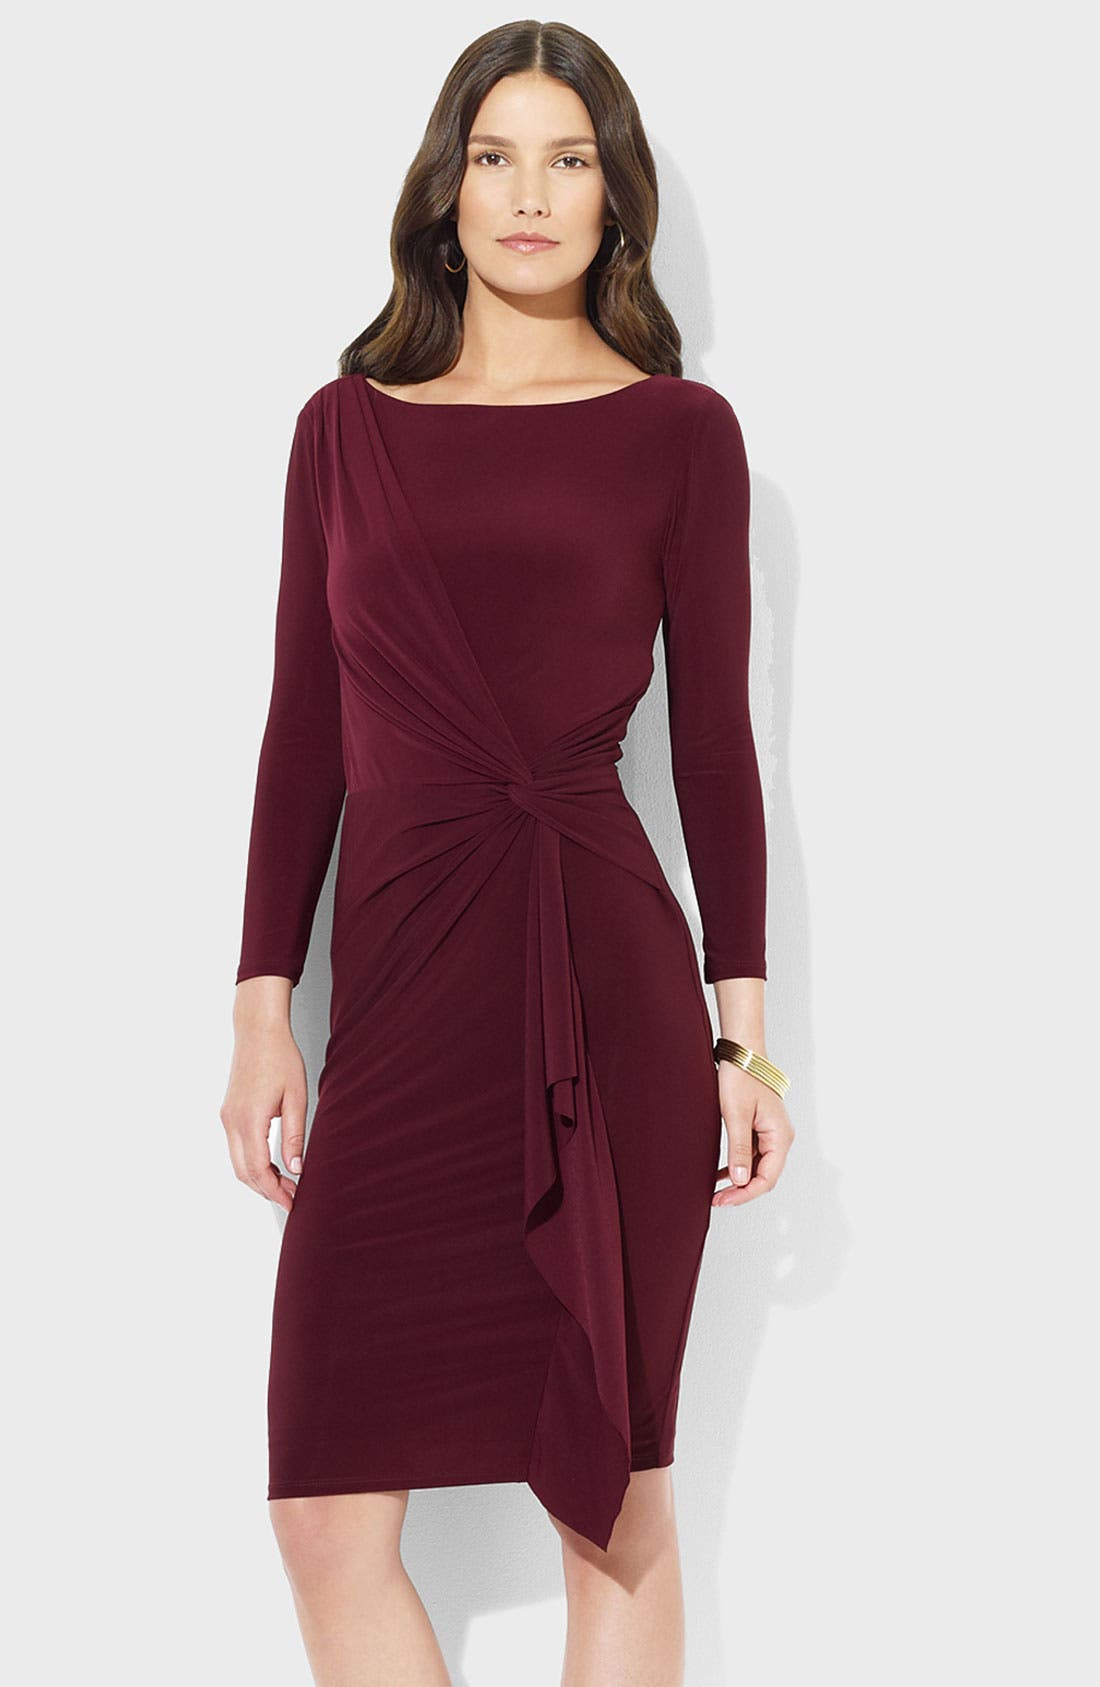 Alternate Image 1 Selected - Lauren Ralph Lauren Front Knot Jersey Sheath Dress